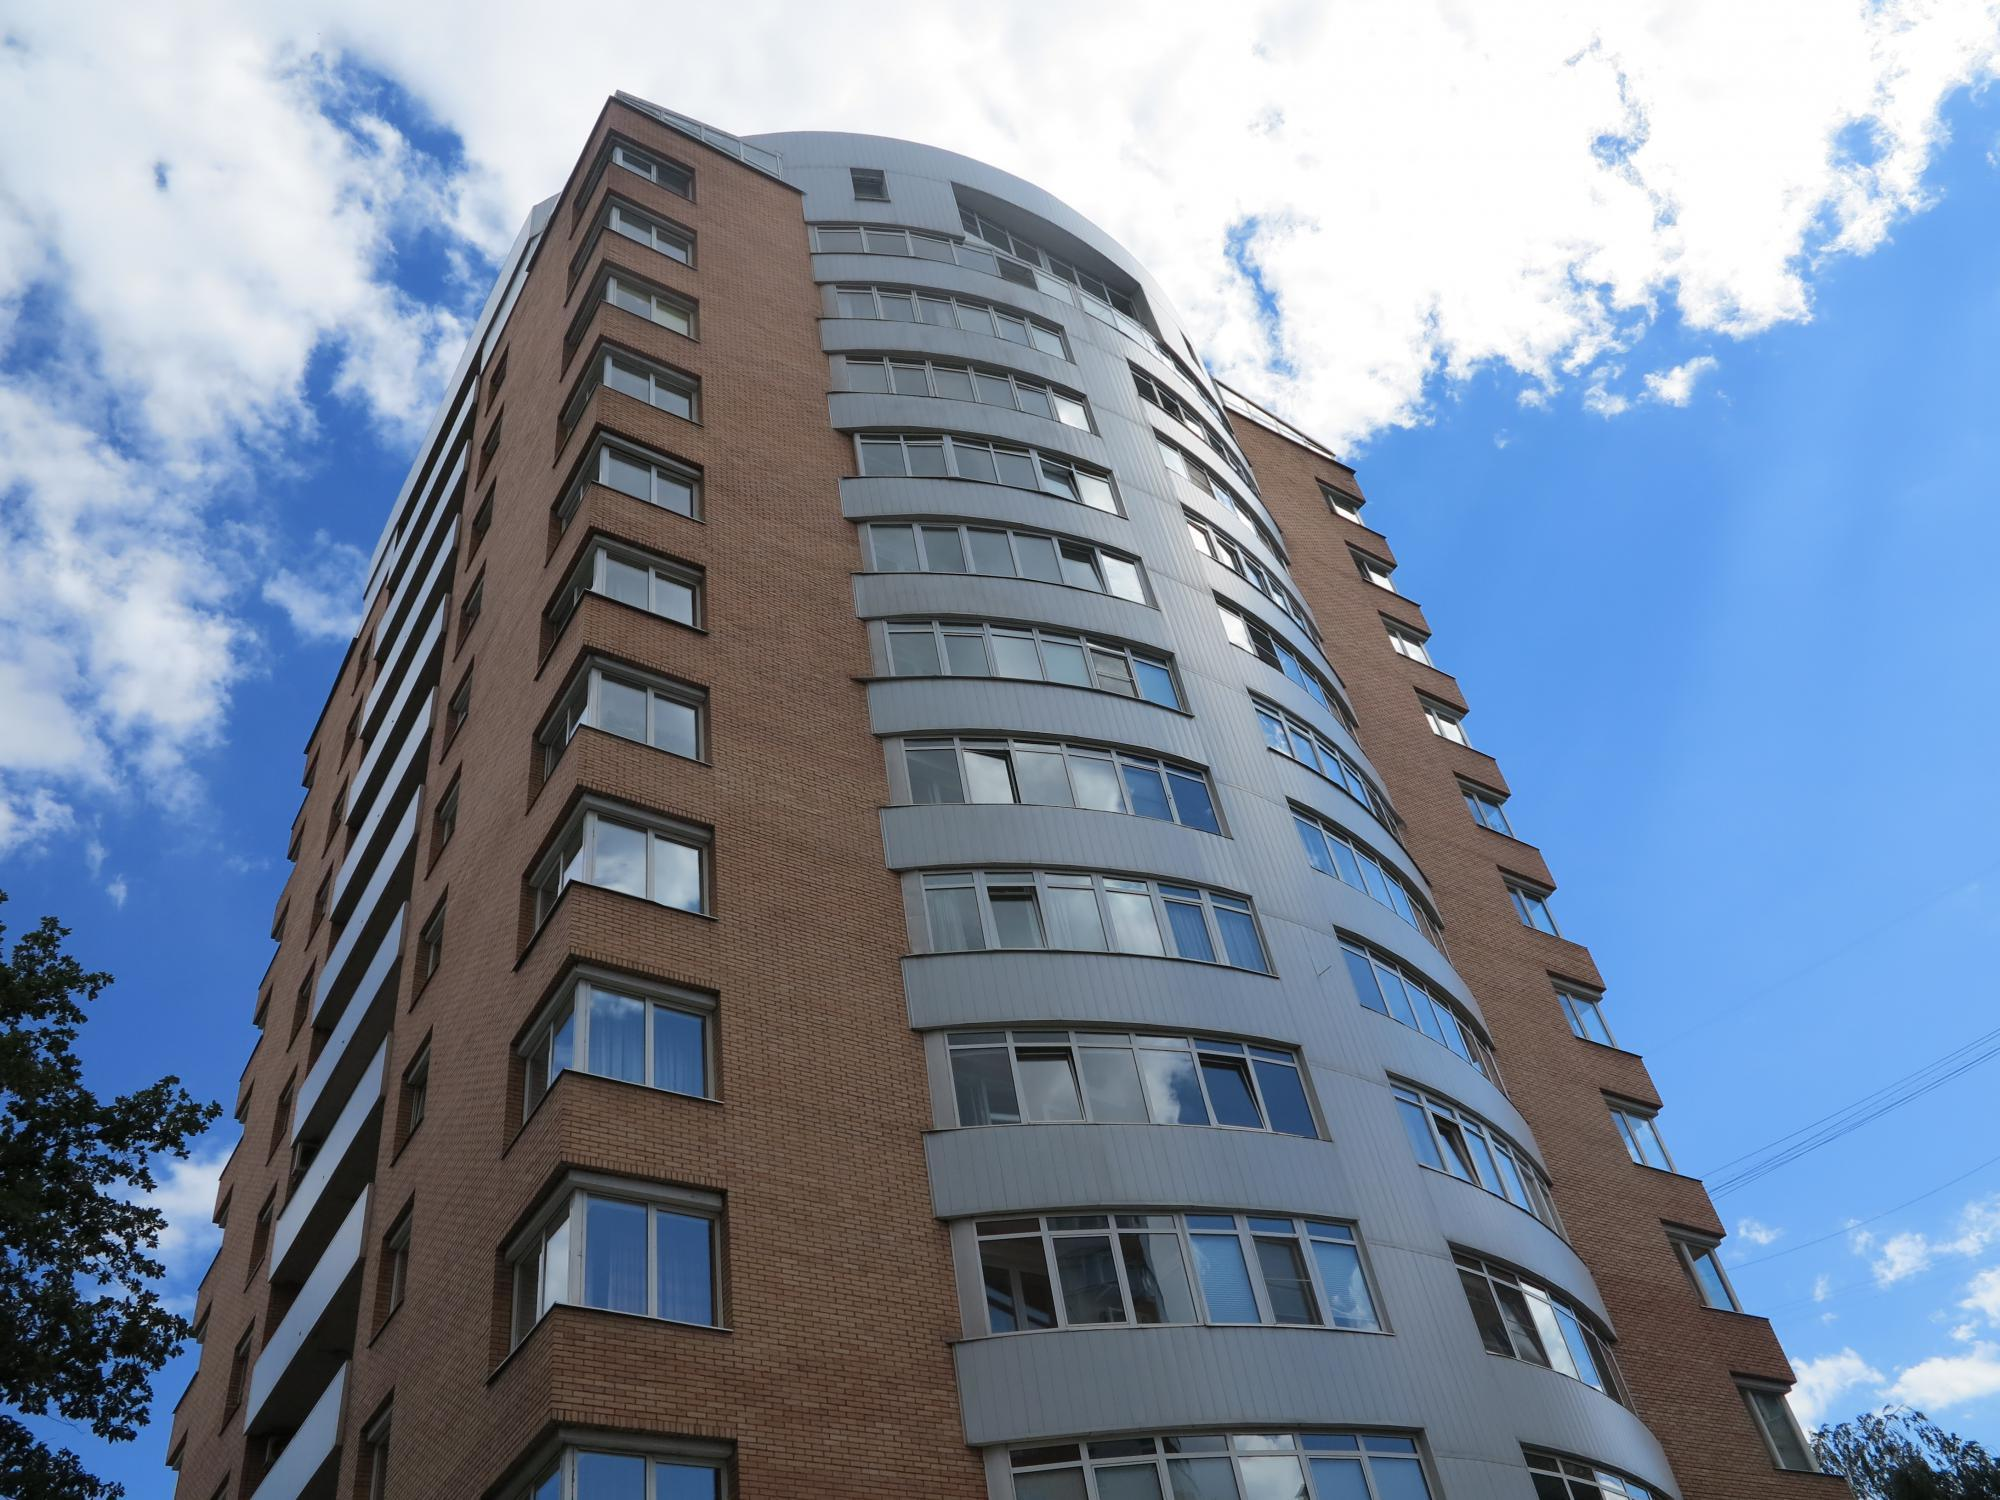 Москва, 4-х комнатная квартира, ул. Звенигородская д.5, 115475890 руб.